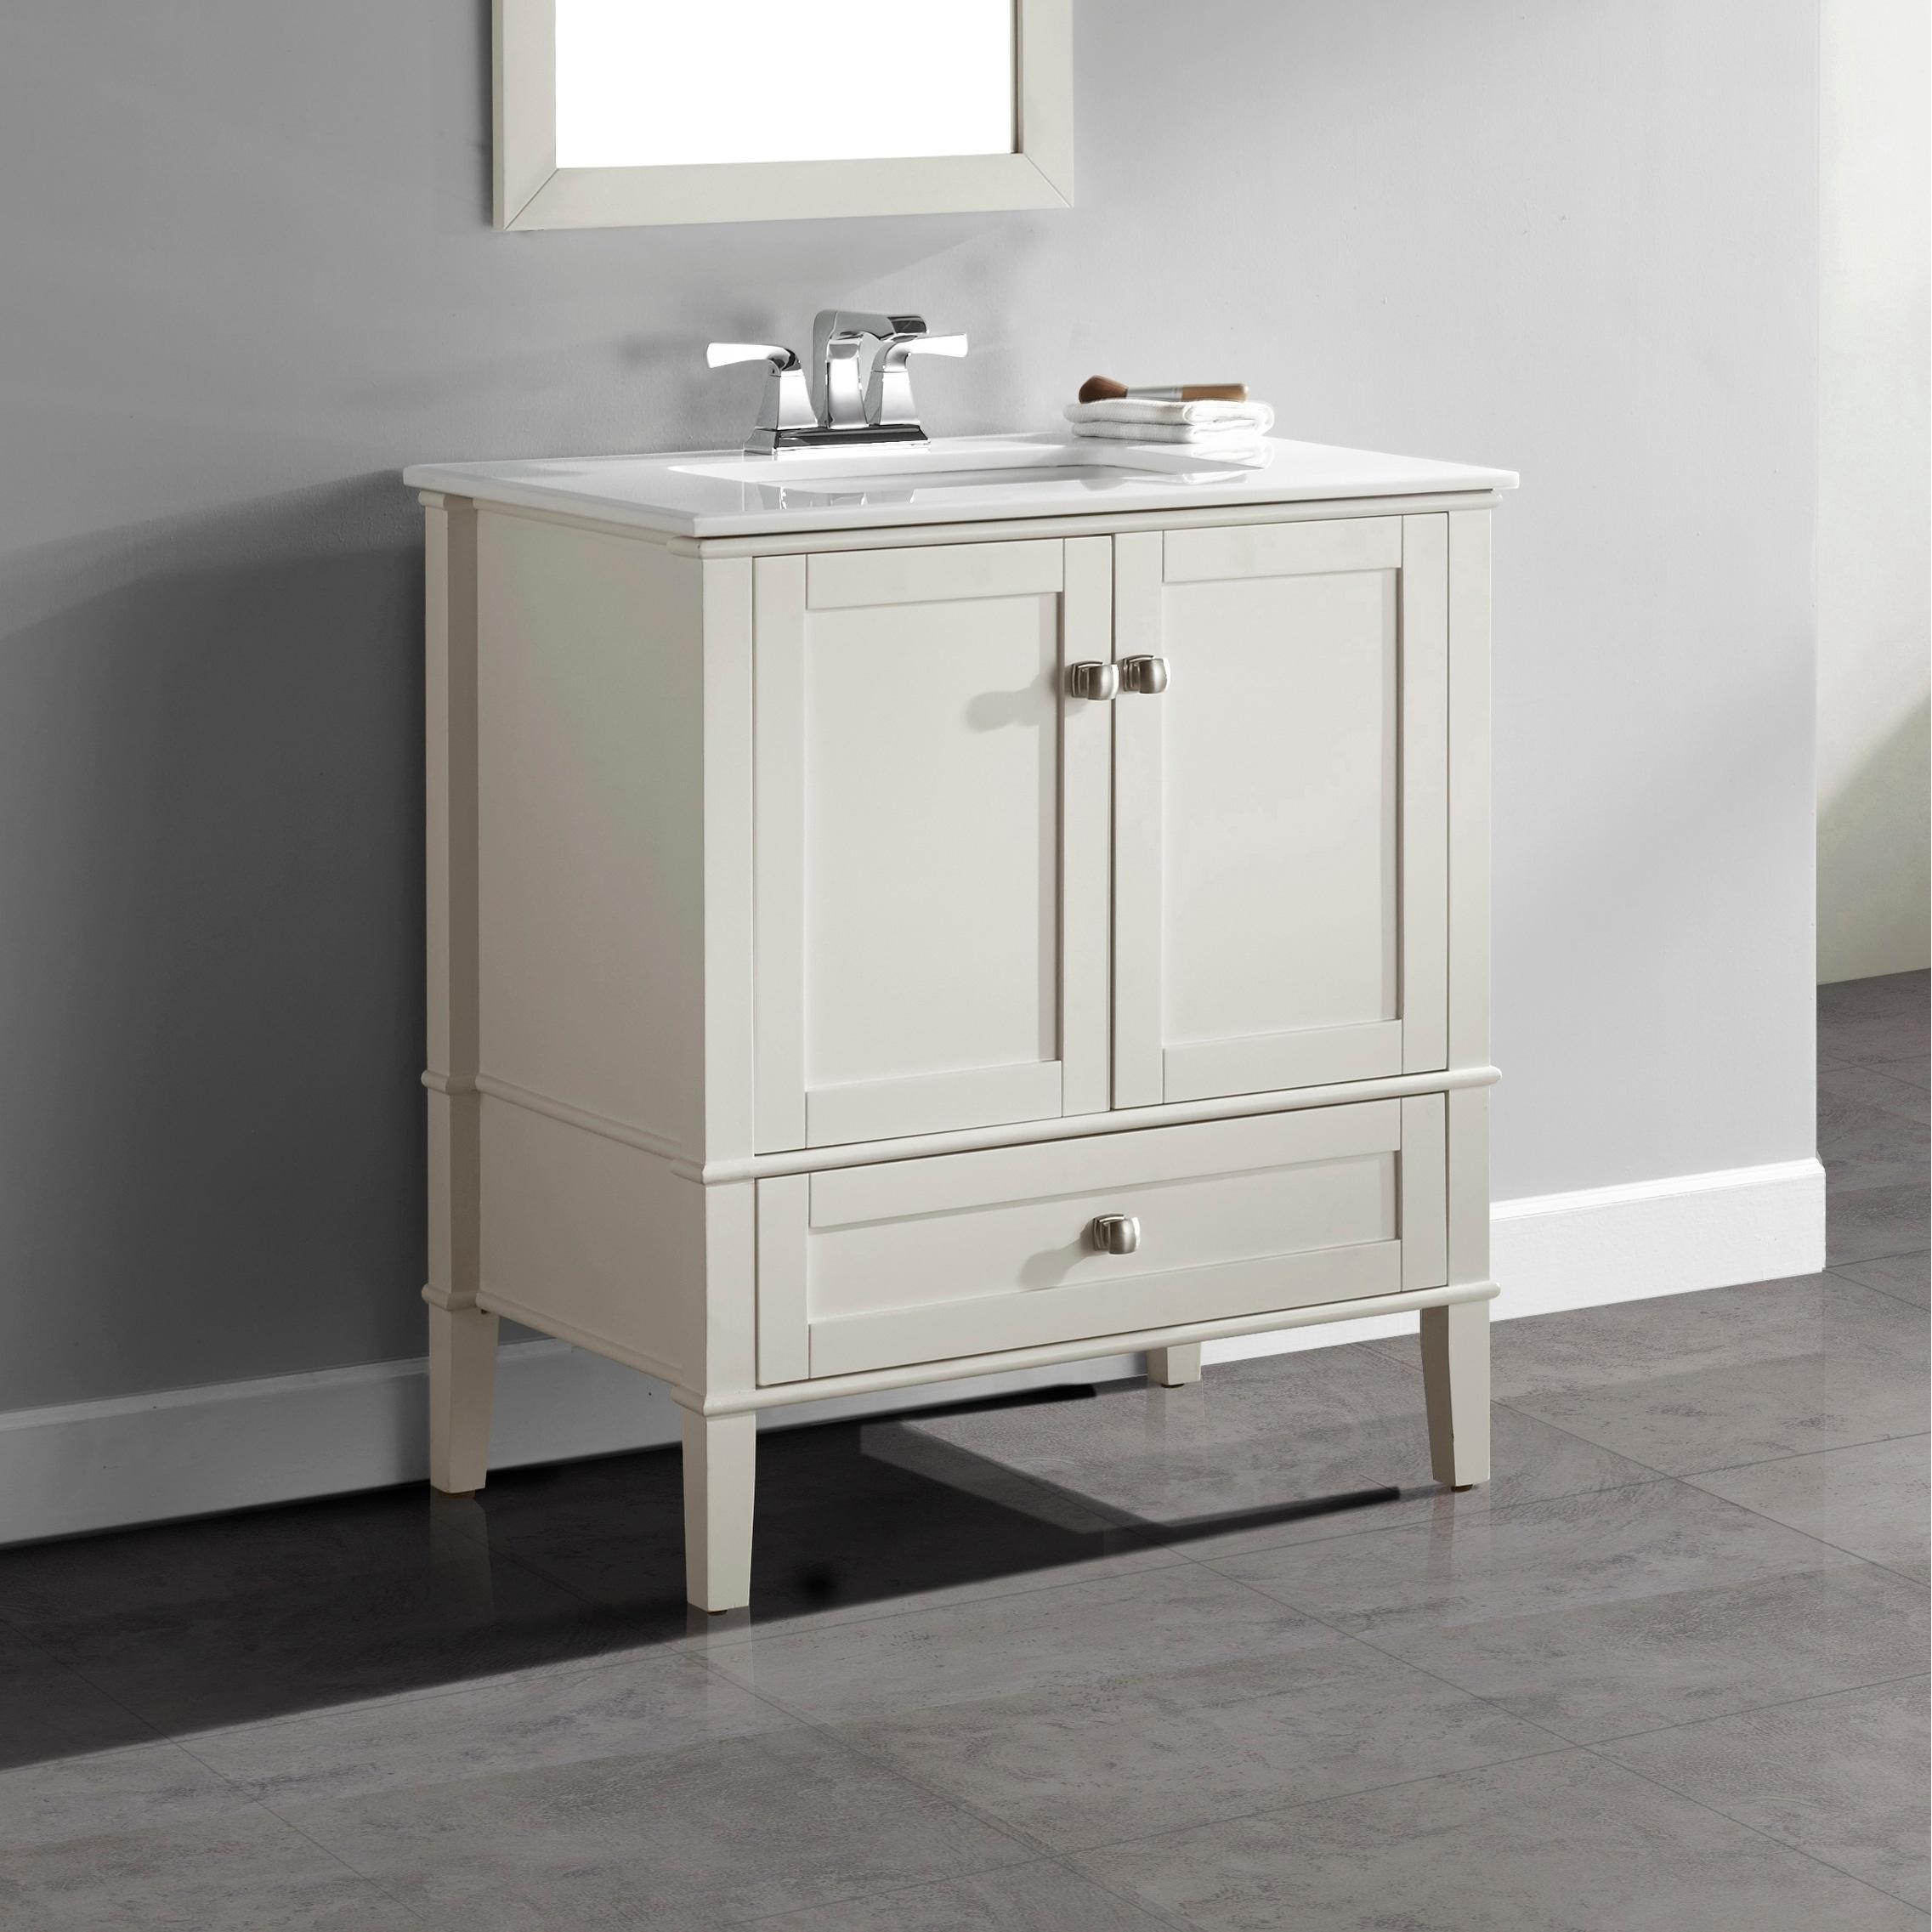 Wyndenhall Windham 30 Inch Contemporary Bath Vanity In Soft White With Engineered Quartz Marble Top